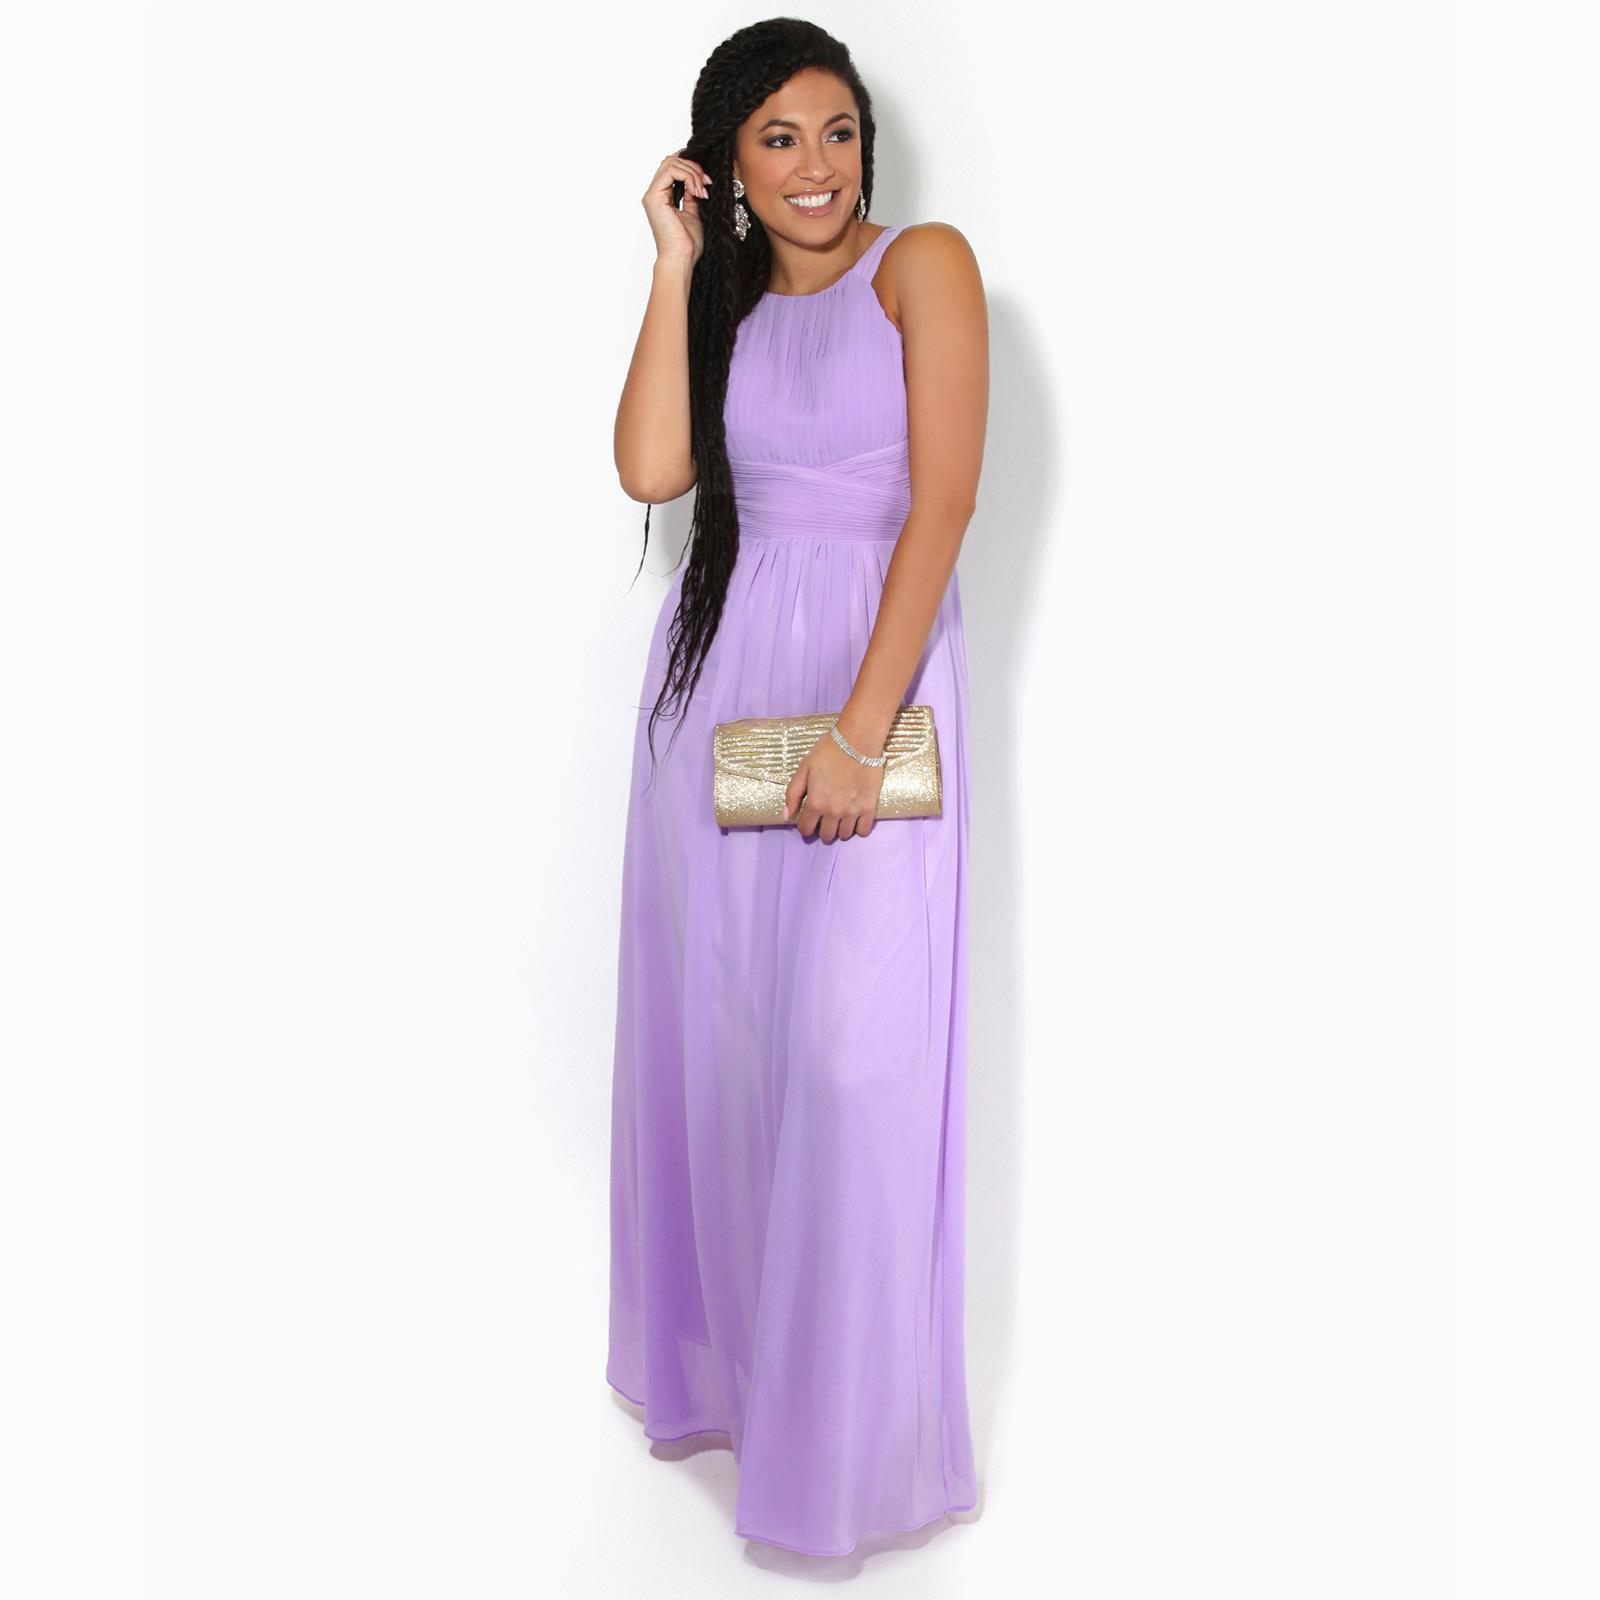 Women-Ladies-Long-Cocktail-Wedding-Bridesmaid-Evening-Maxi-Dress-Formal-Gown thumbnail 12